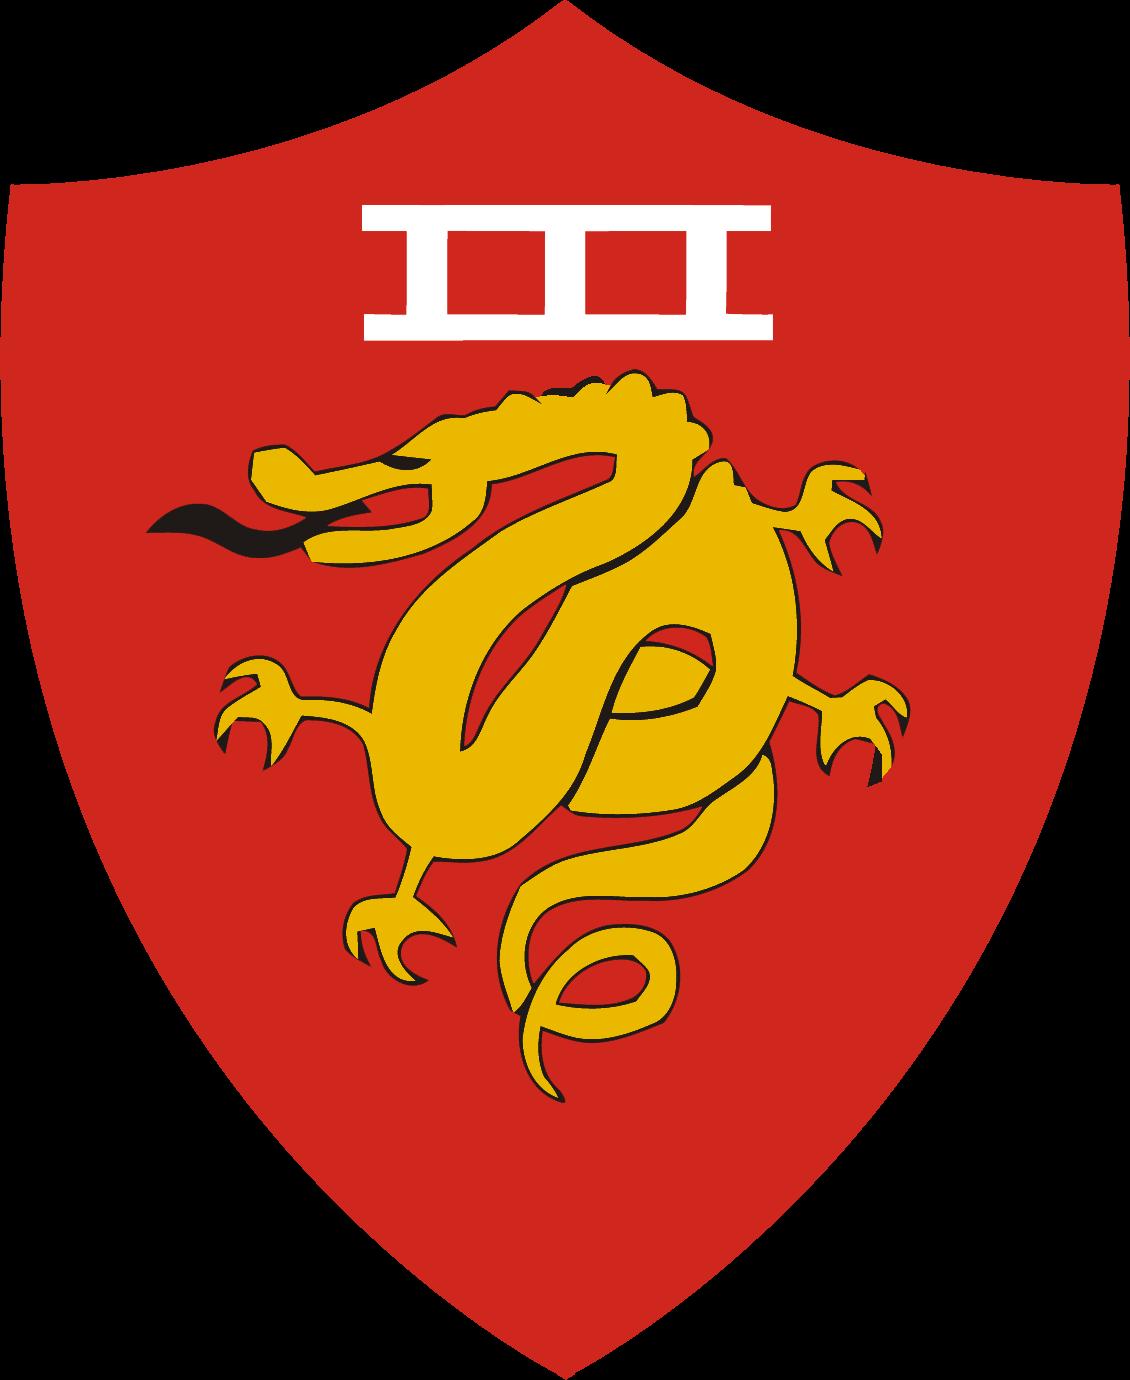 File:USMC III Phib Corps Large.png - Wikimedia Commons